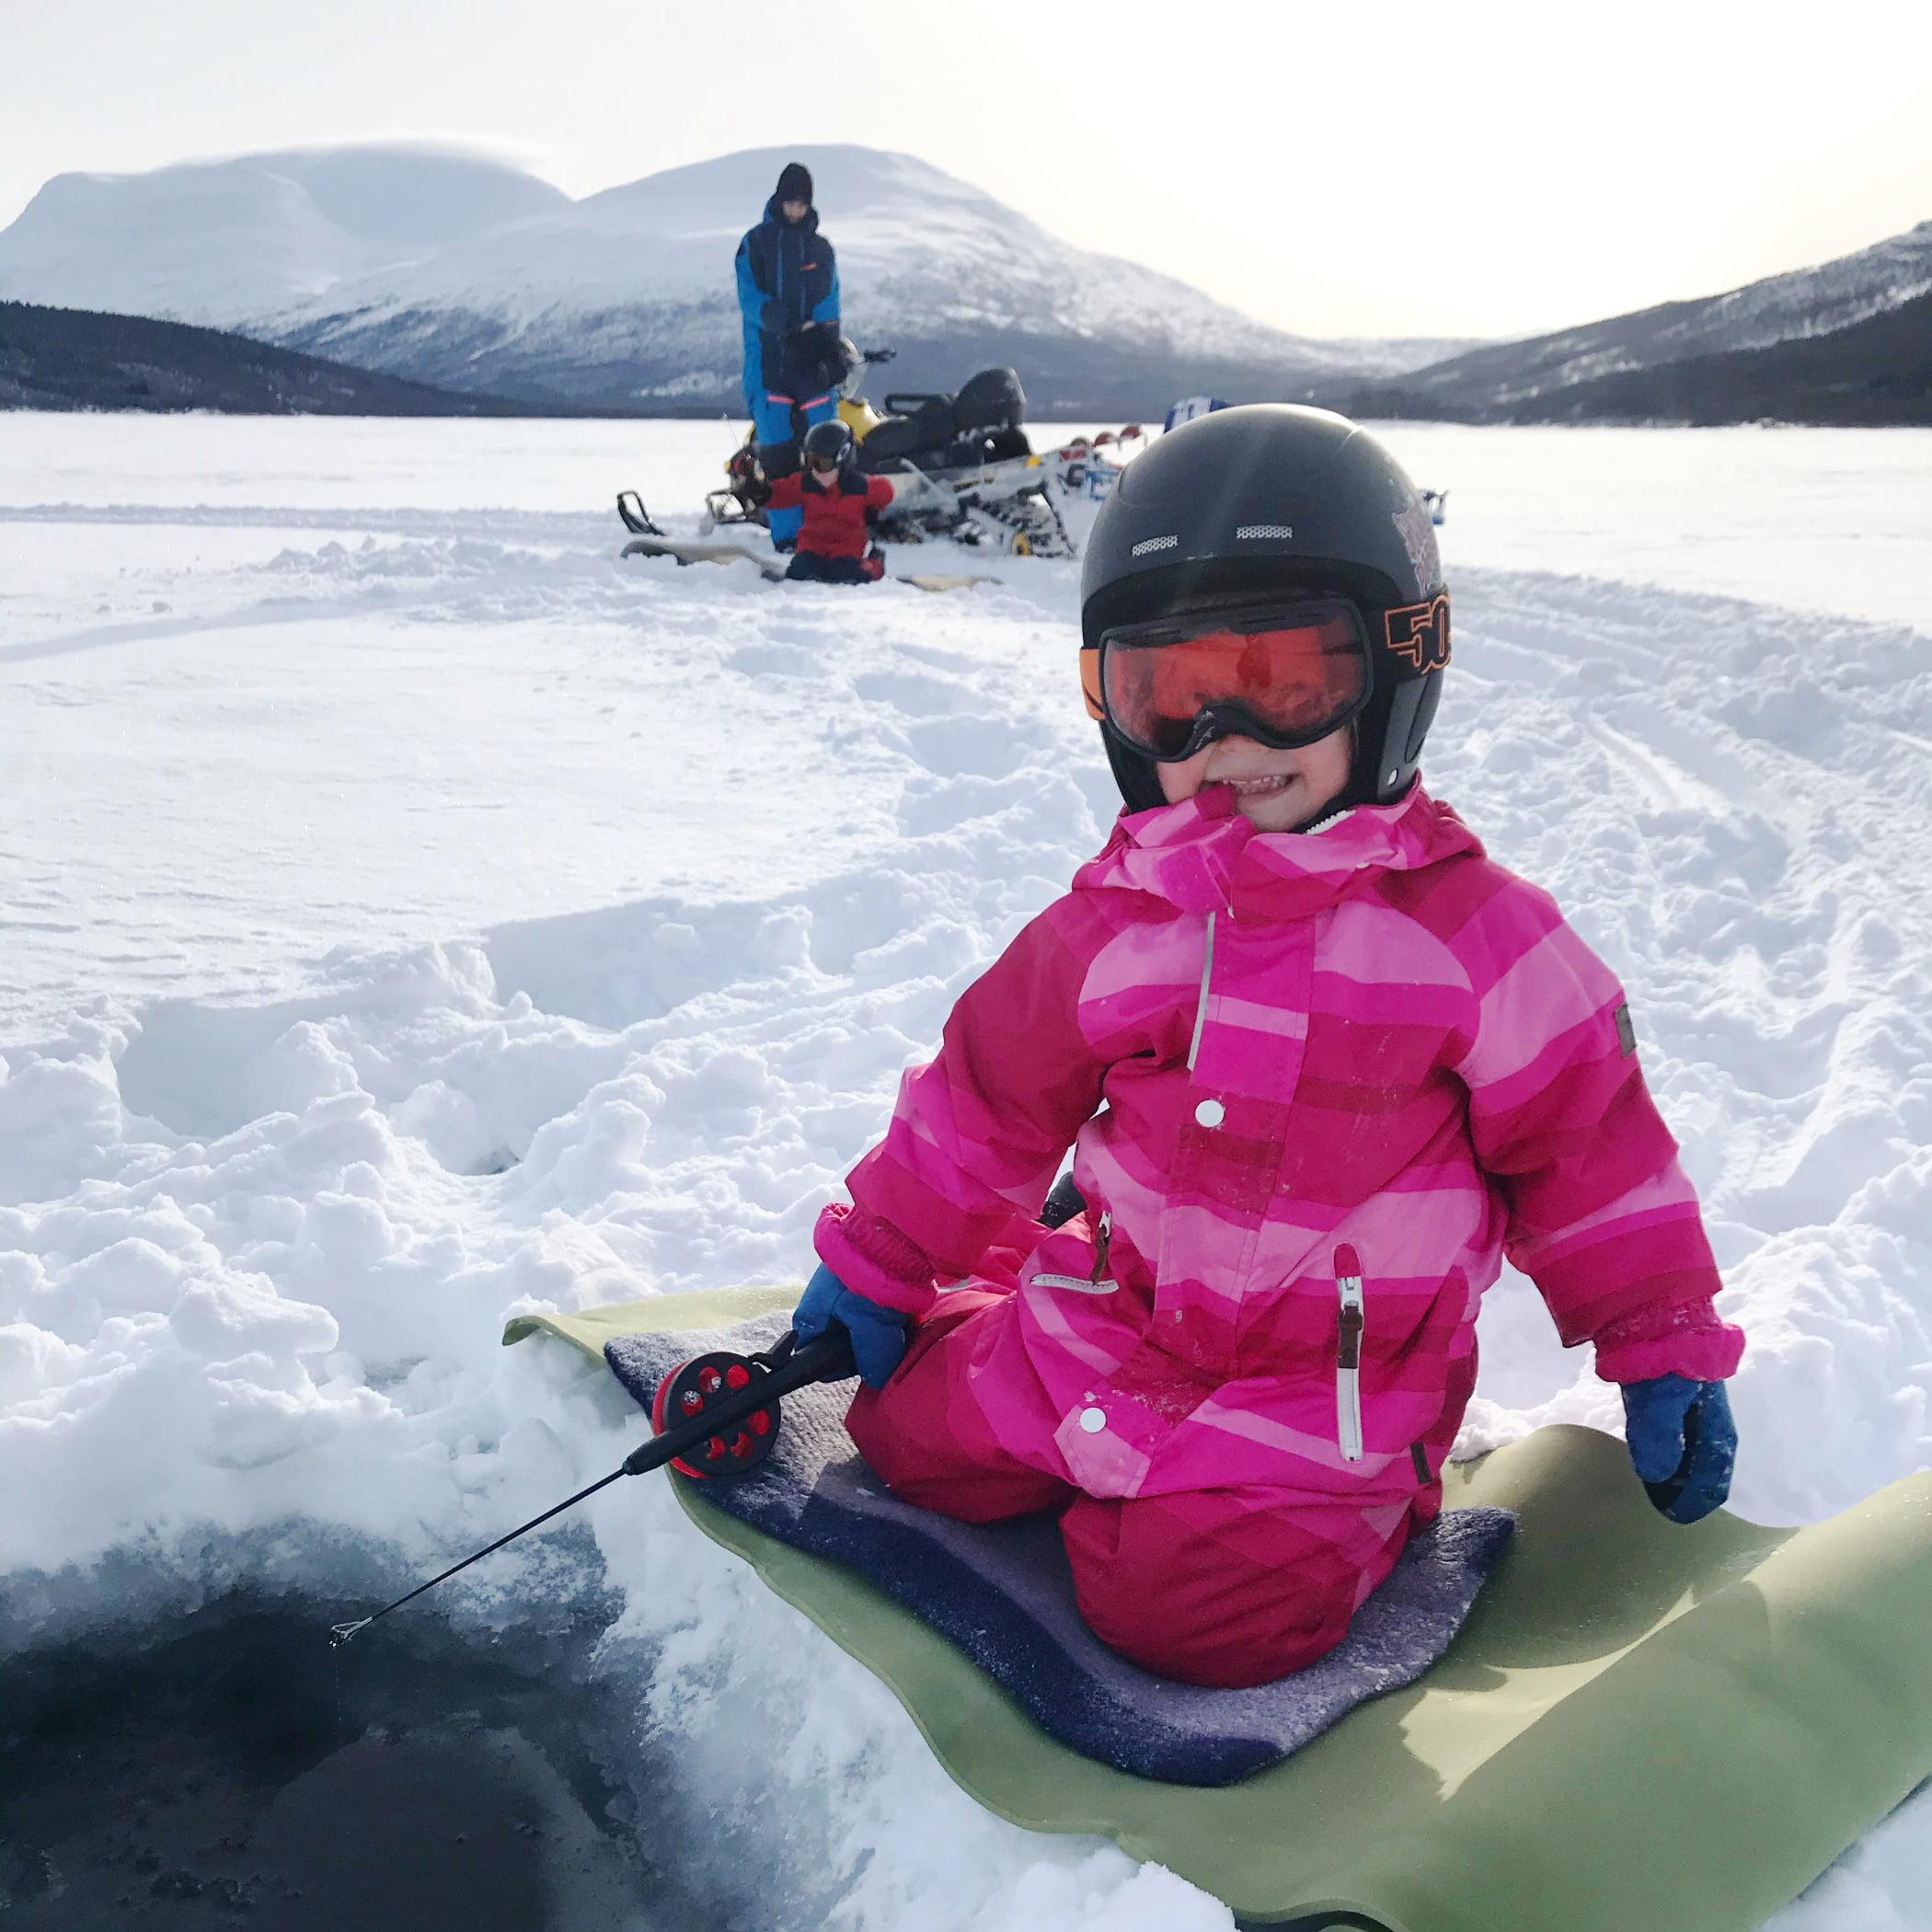 Sports equipment, Winter sport, Sky, Helmet, Snow, White, Mountain, Glove, Sleeve, Vehicle